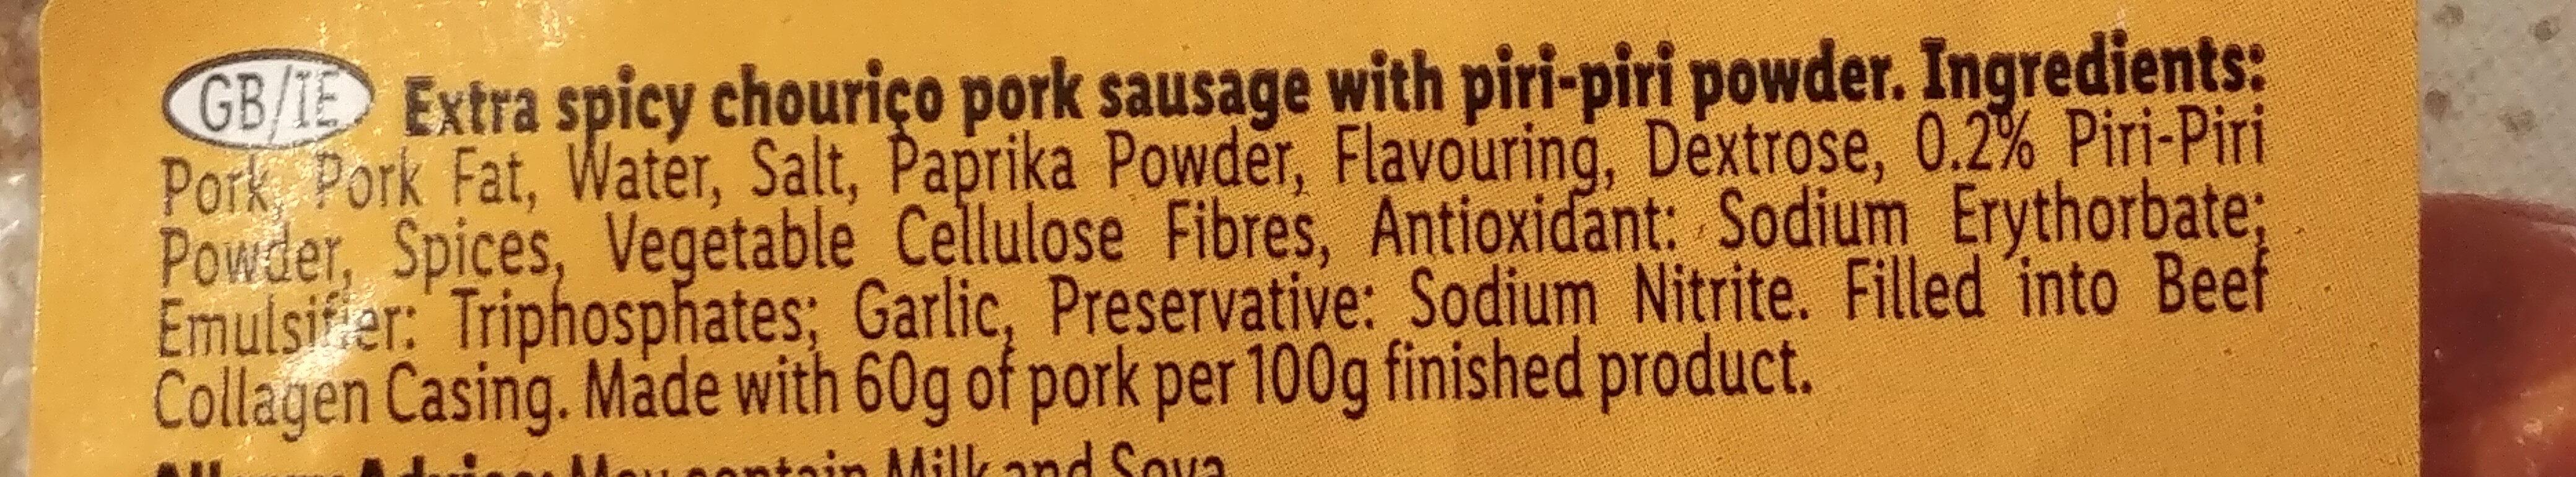 Extra spicy chouriço sausage - Ingredients - en